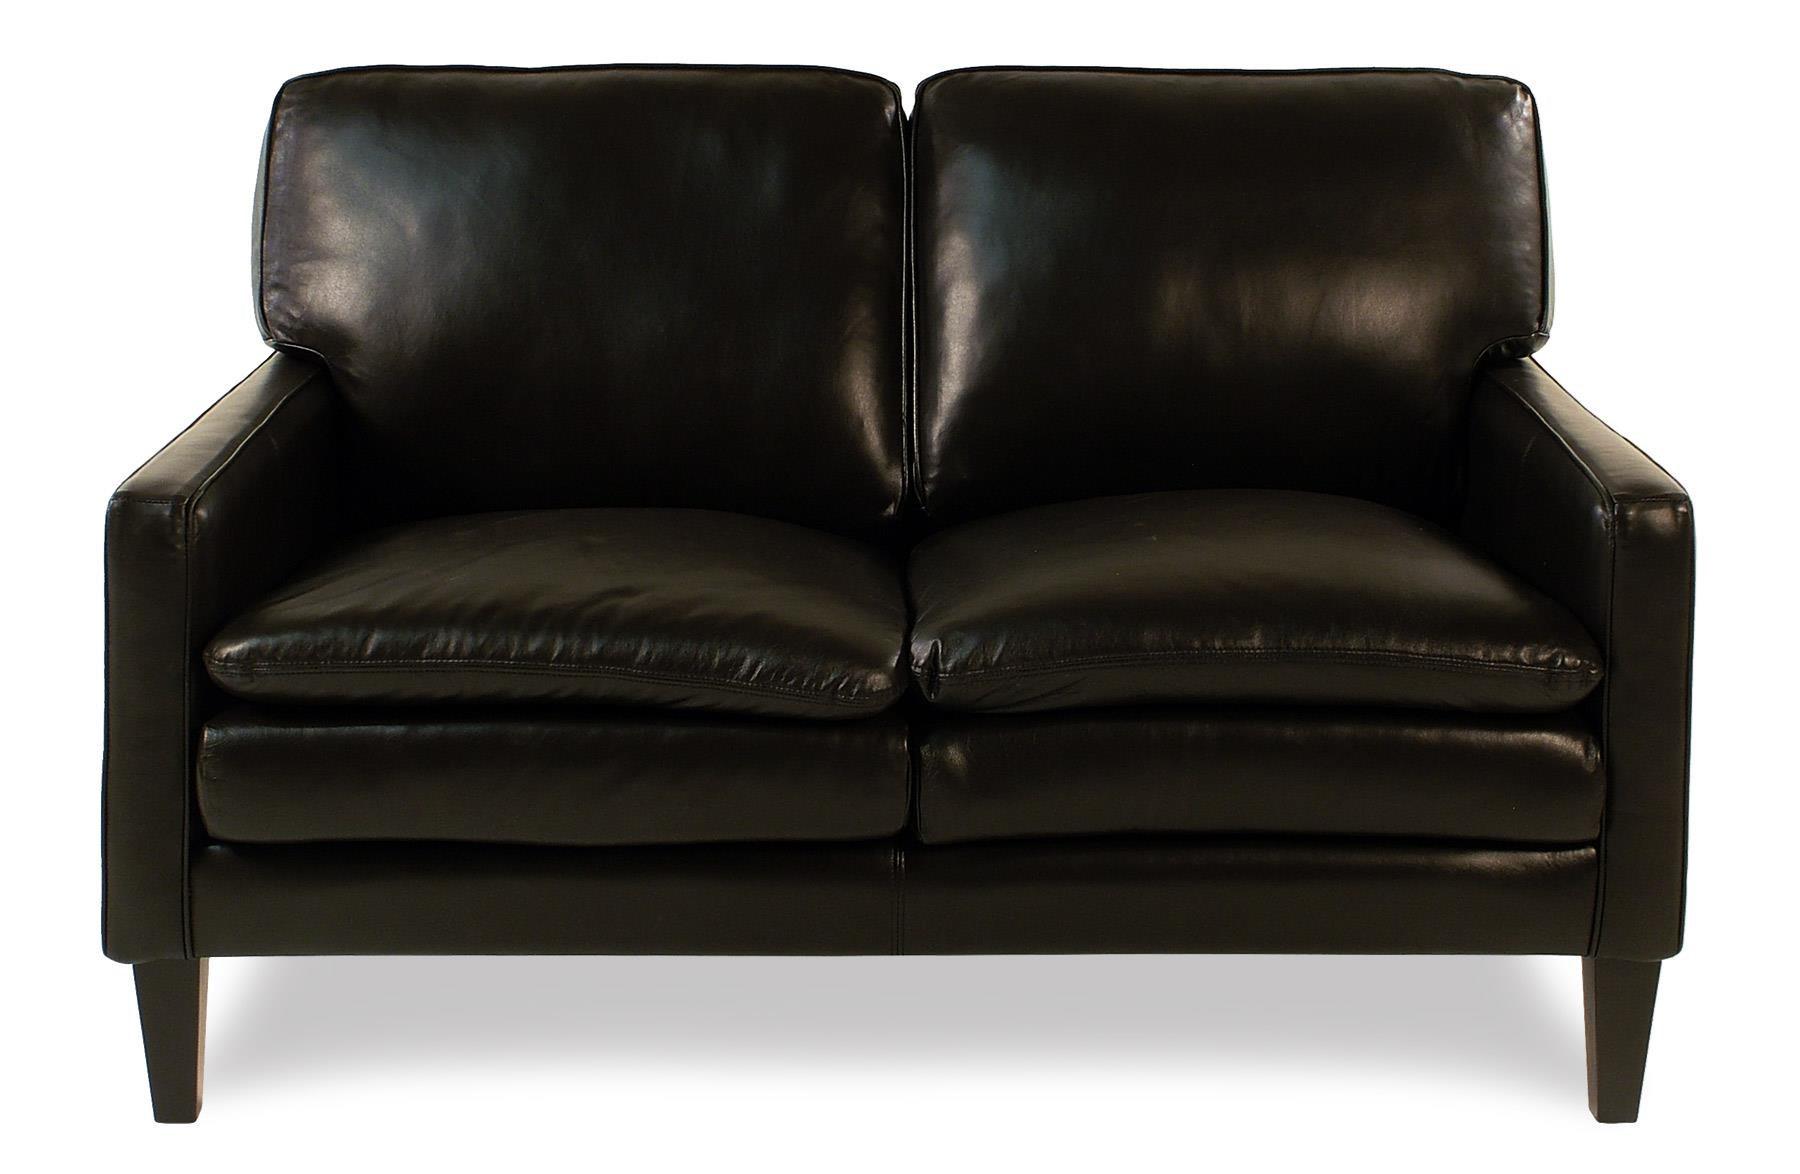 Decor-Rest Lorenzo Leather Loveseat w/ Tapered Legs - Item Number: 3565LS-ESPRESSO